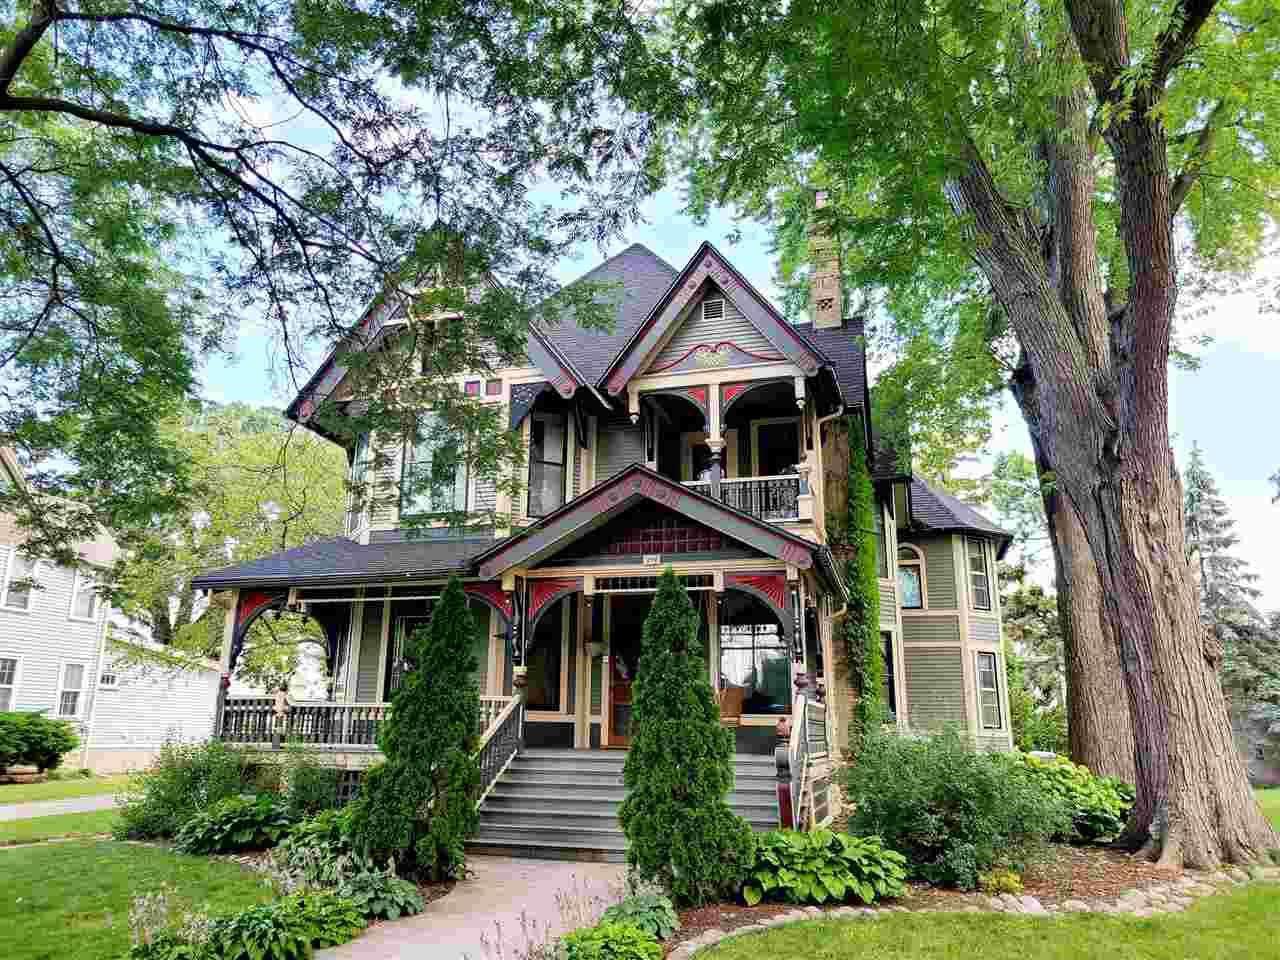 294 E DIVISION STREET, Fond du Lac, WI 54935 - MLS#: 50245230